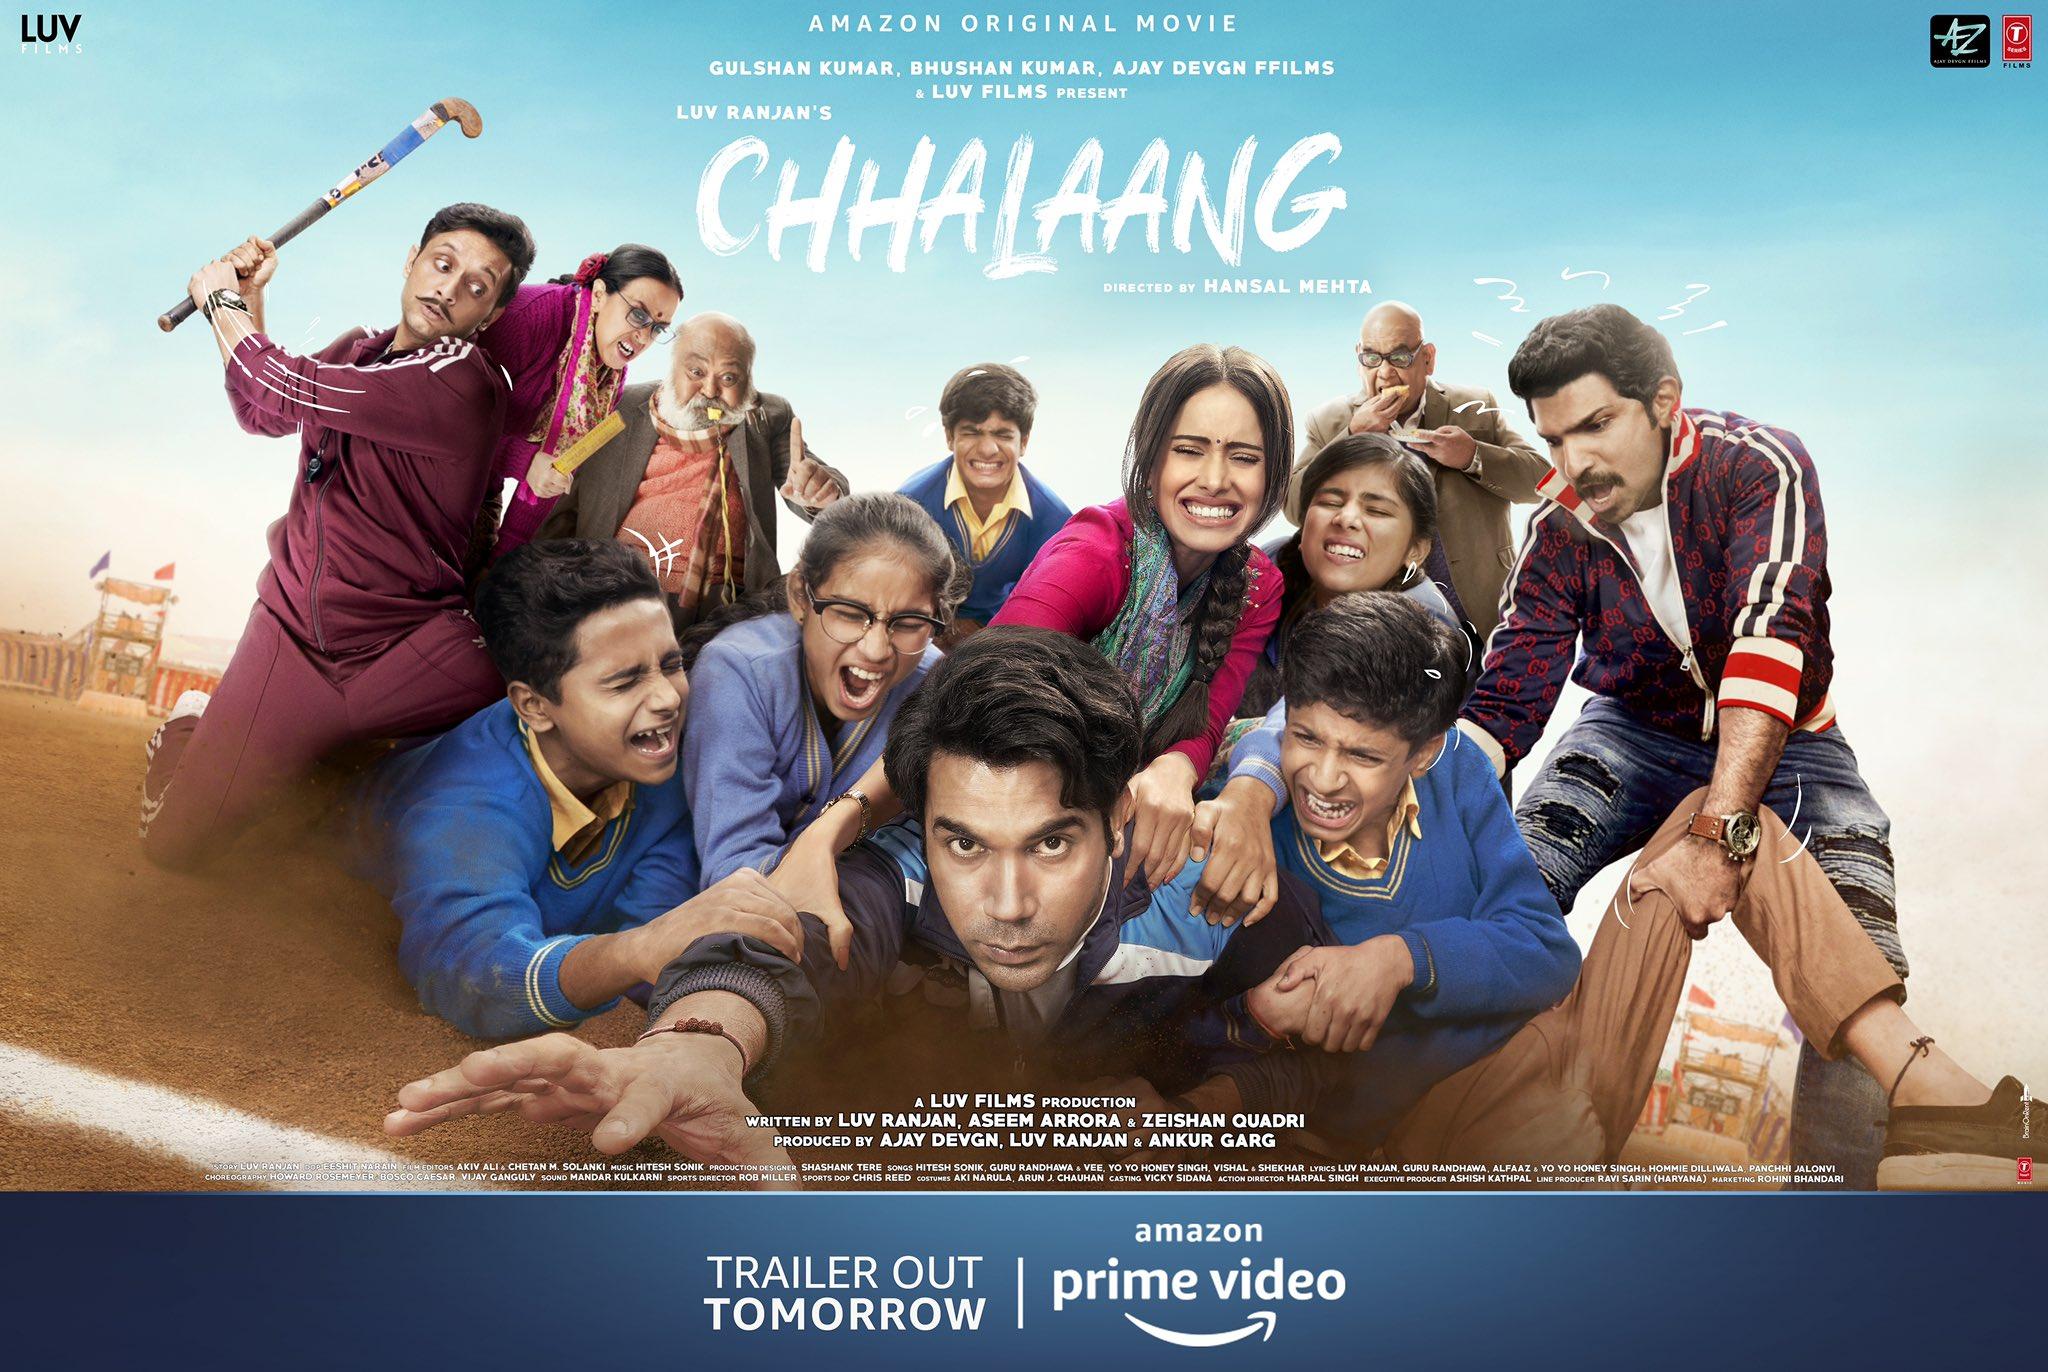 Chhalaang Image